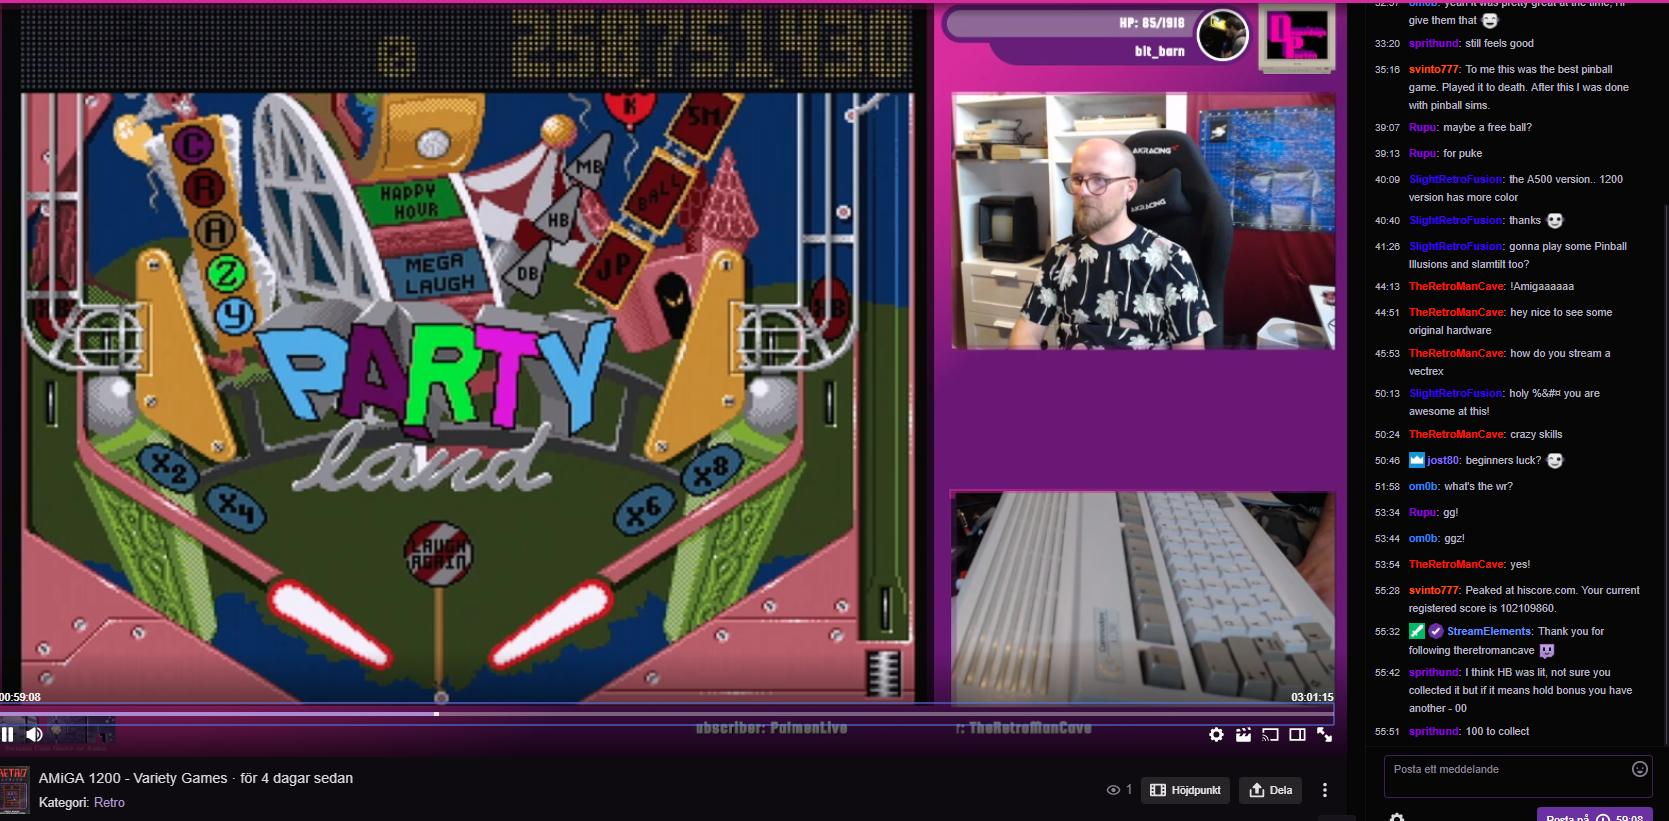 Domedagspoeten: Pinball Fantasies: Party Land (Amiga) 258,751,430 points on 2019-06-28 10:13:08